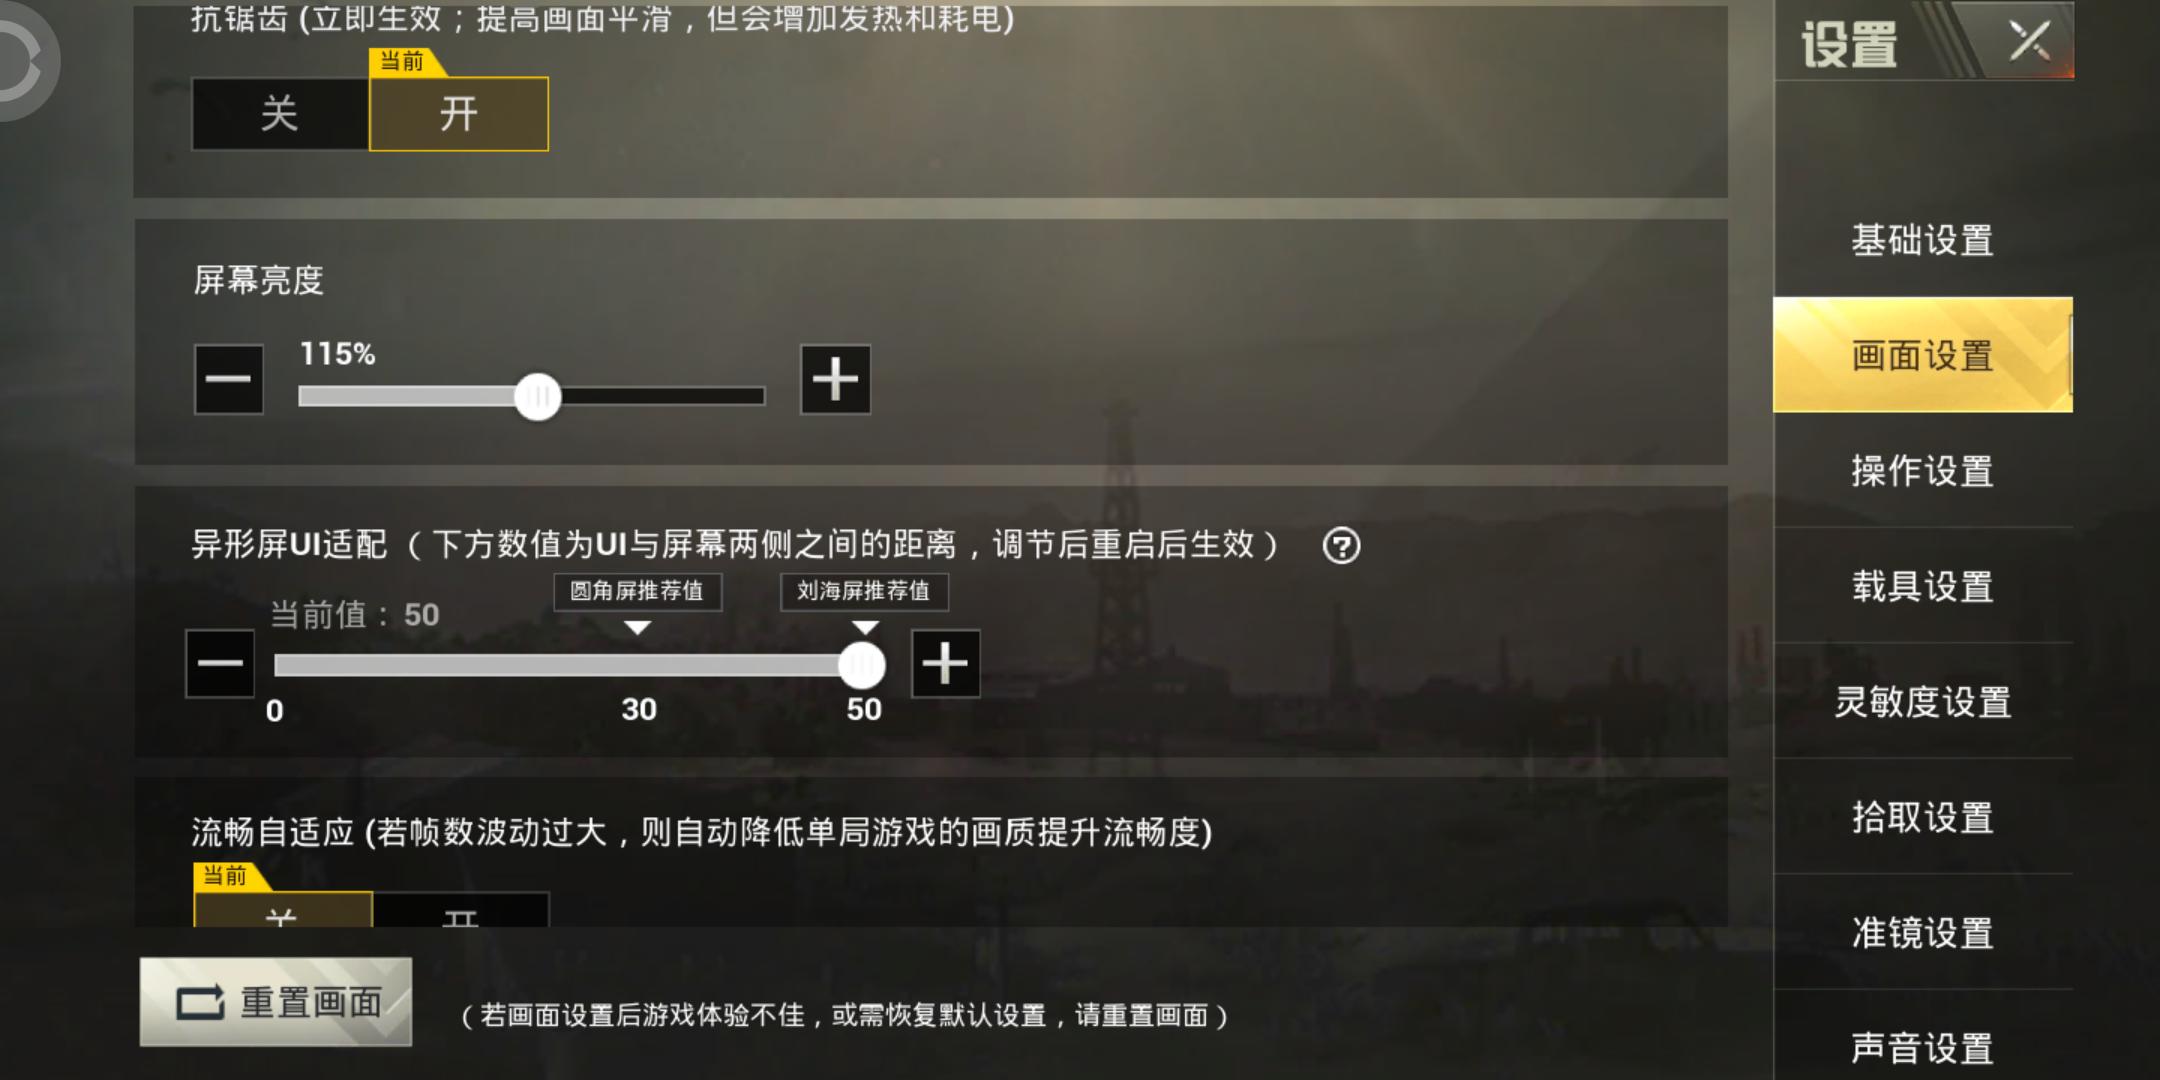 Screenshot_2018-11-18-00-15-31.png